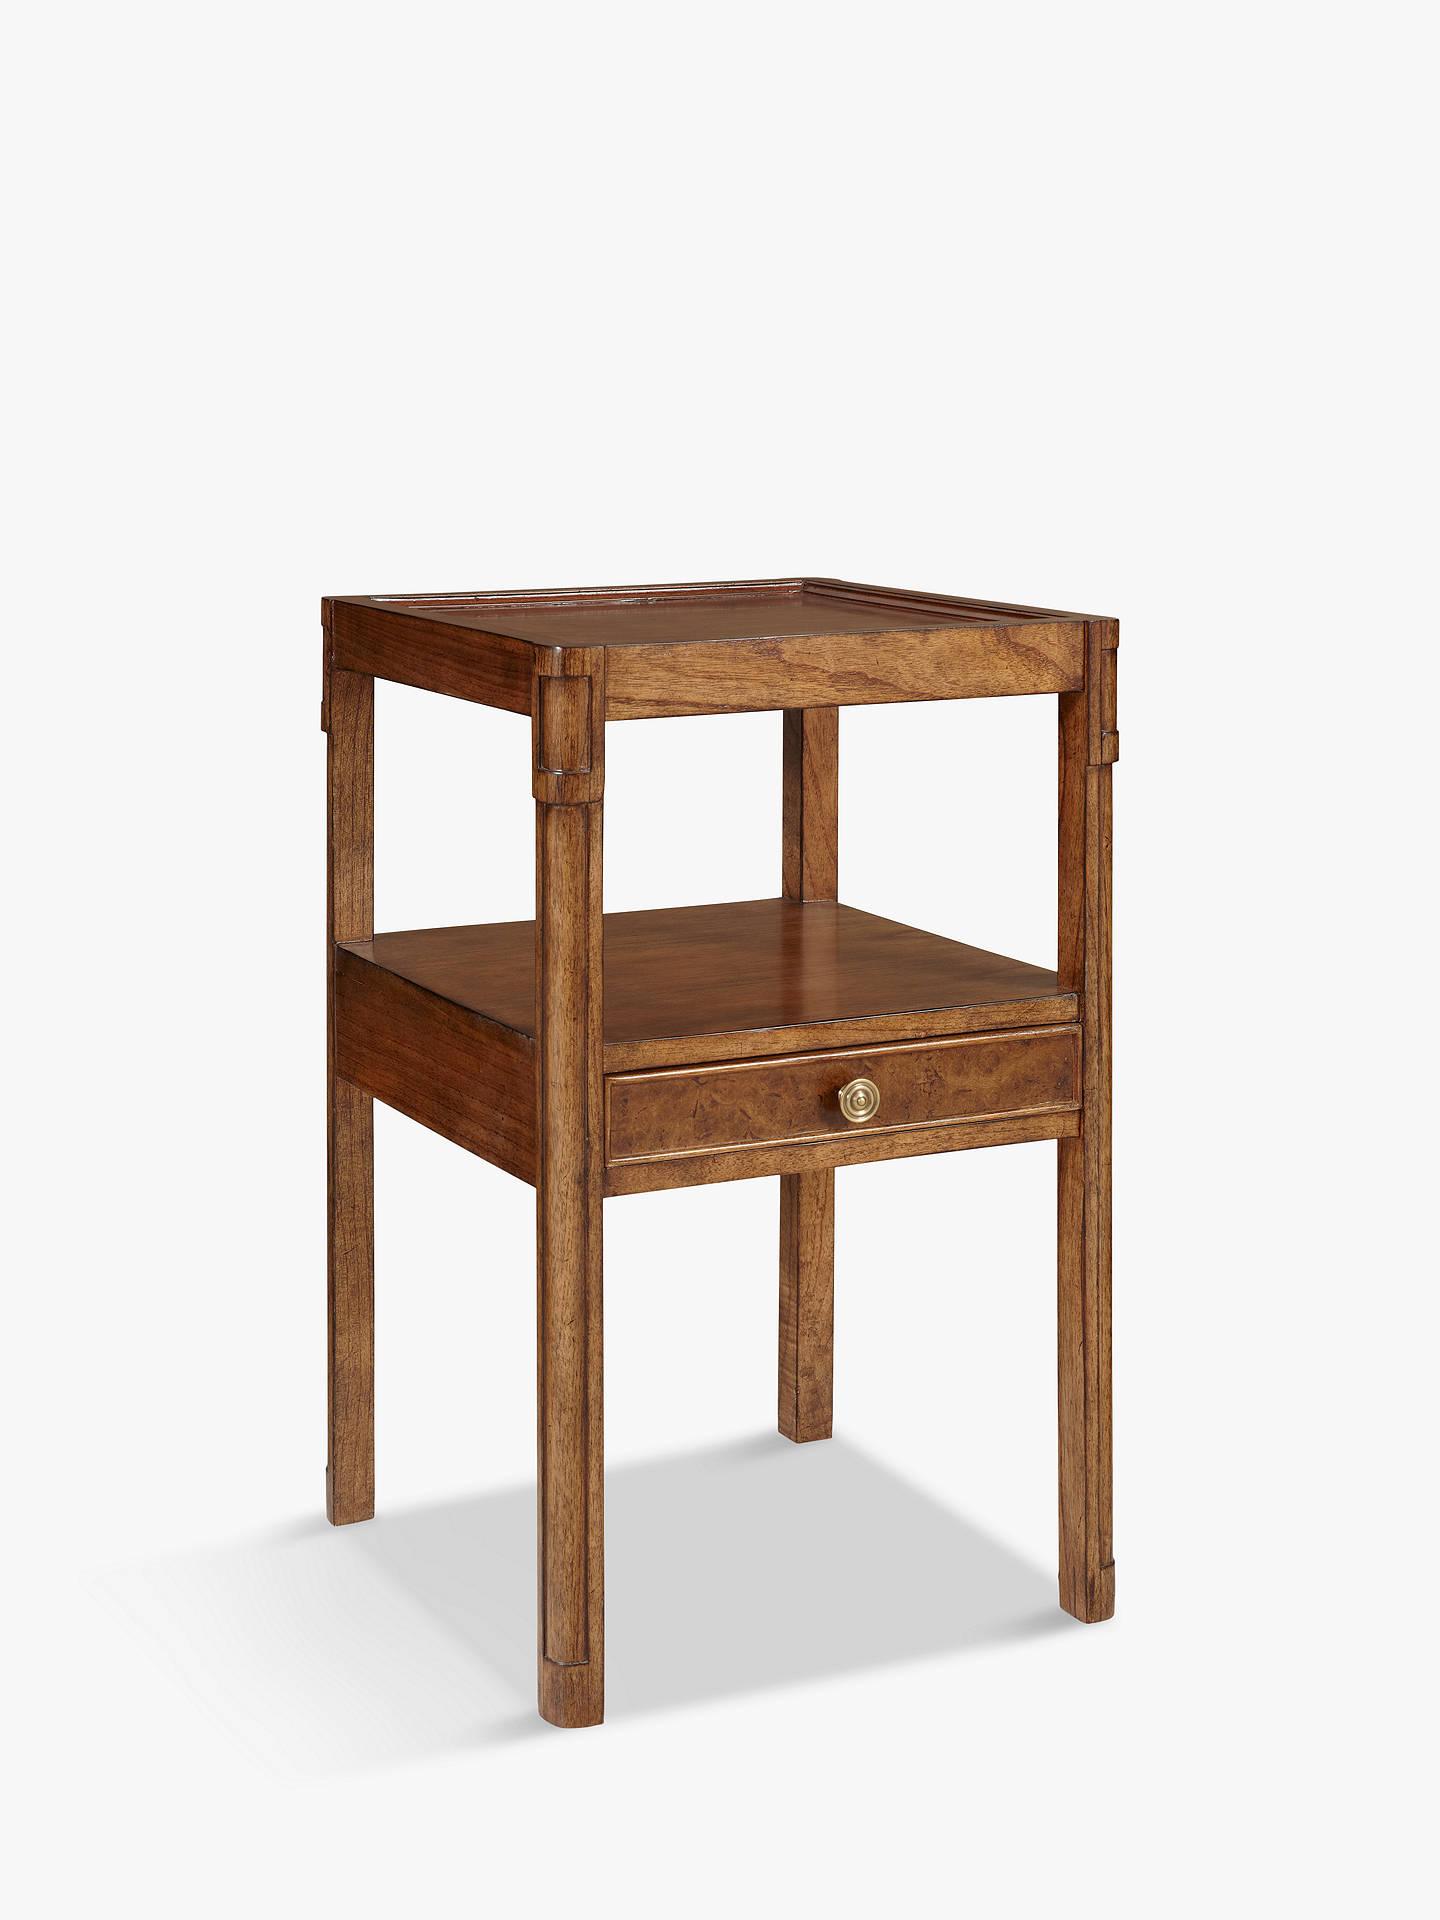 john lewis partners hemingway side table with drawer at. Black Bedroom Furniture Sets. Home Design Ideas